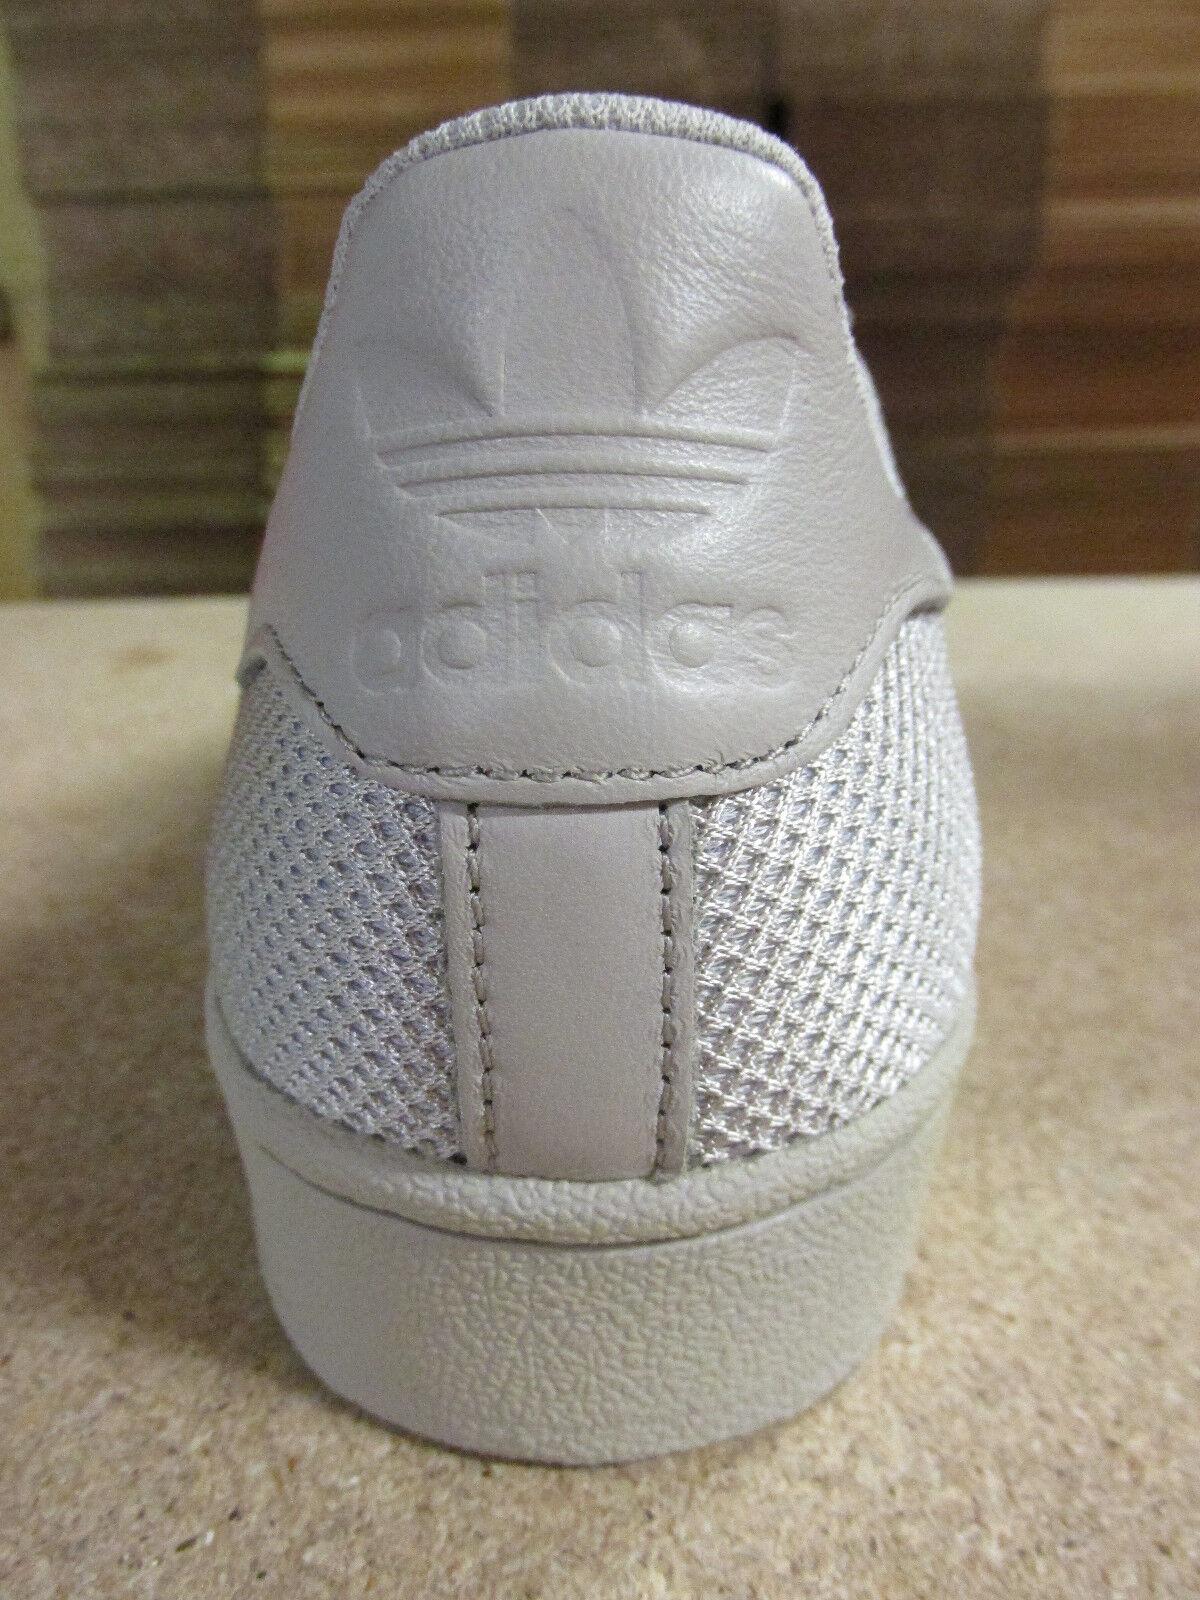 ADIDAS Originals Superstar TRIPLE scarpe da ginnastica Uomo bb3696 bb3696 bb3696 Scarpe Da Ginnastica Scarpe 6f84ff